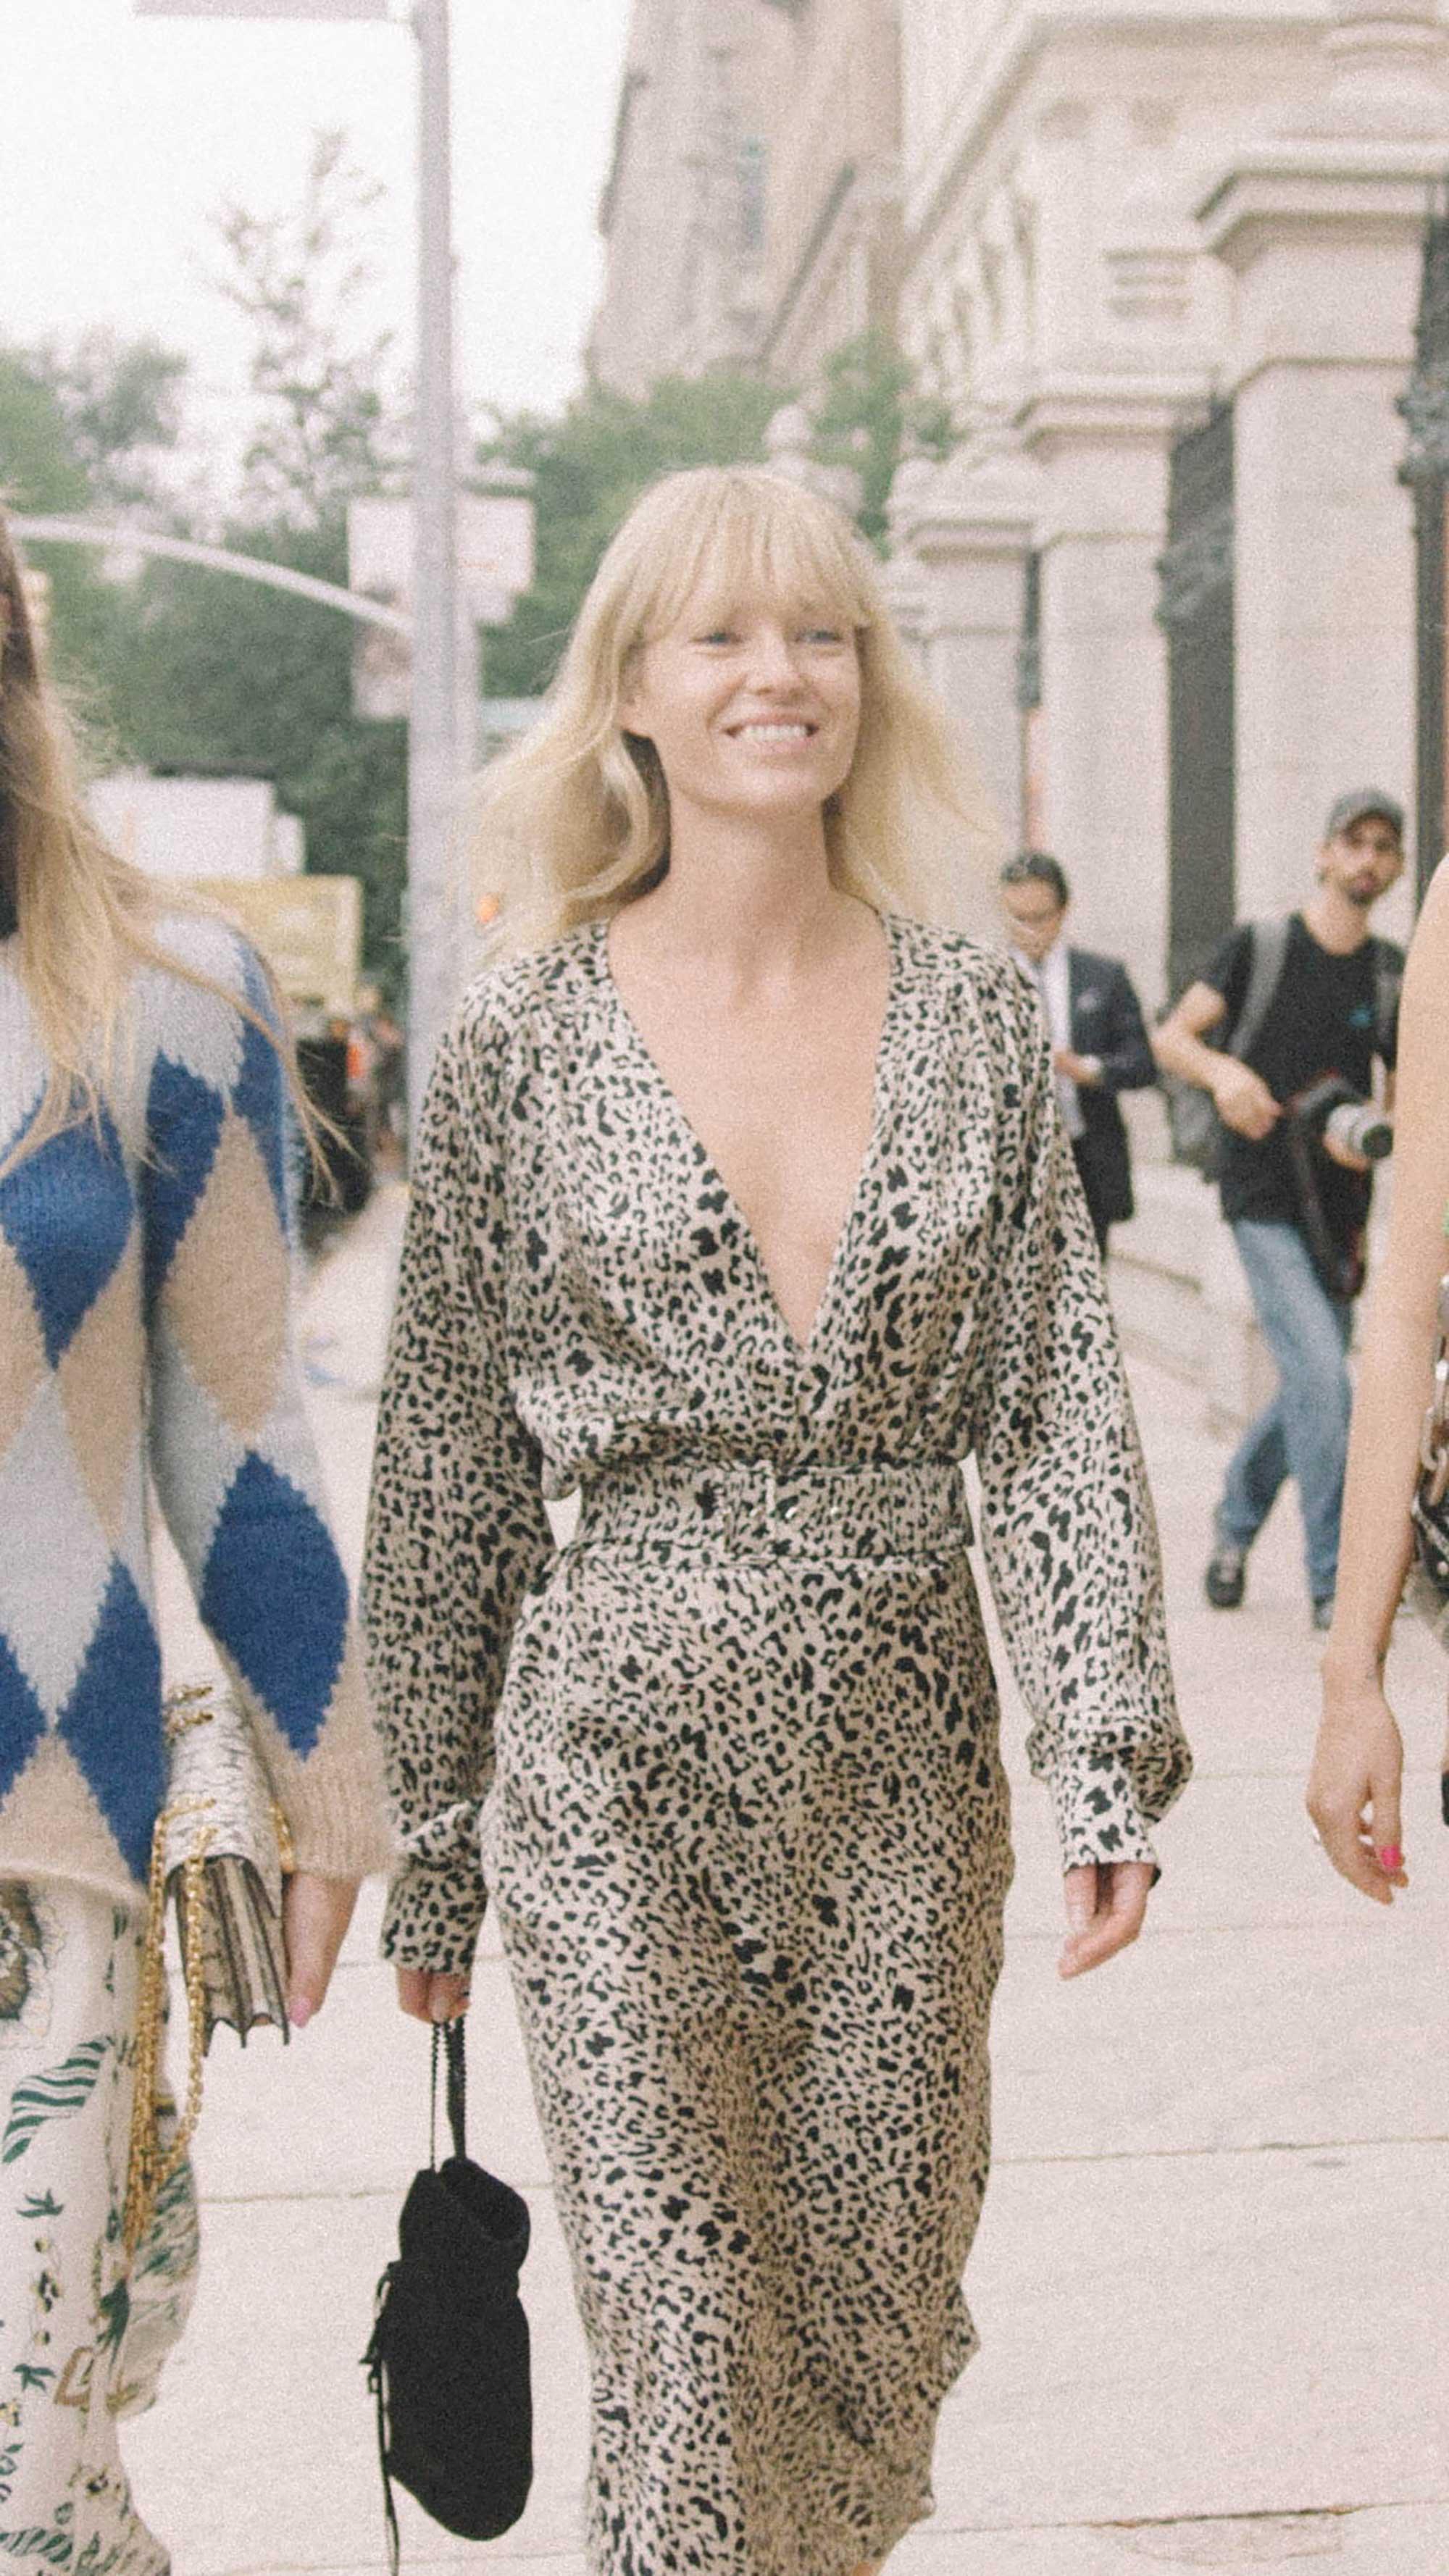 10 Easy Ways to Pull Off Animal Print, silk leopard dress street style 1.jpg